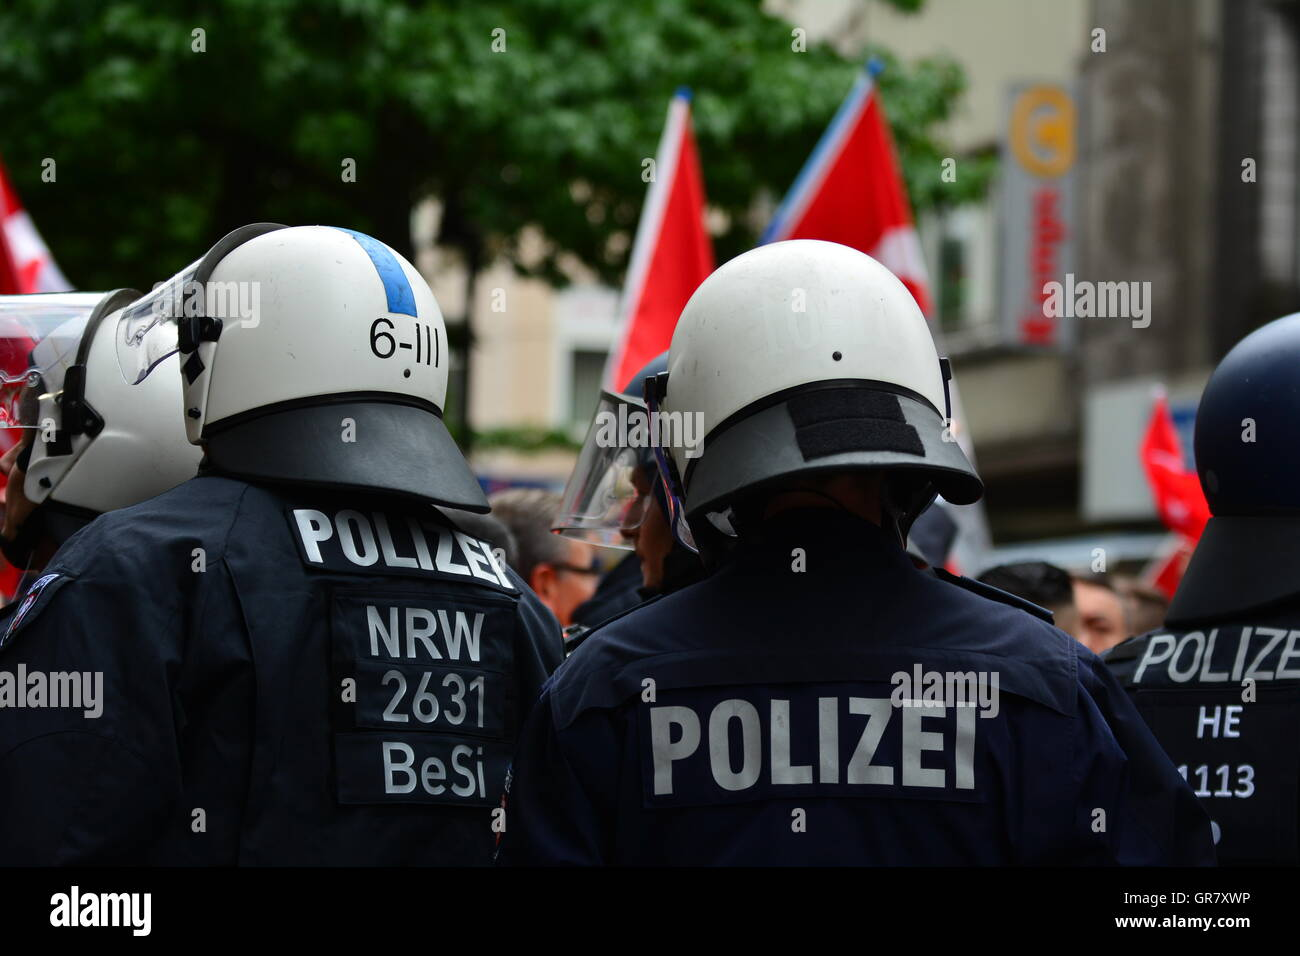 German Police - Stock Image